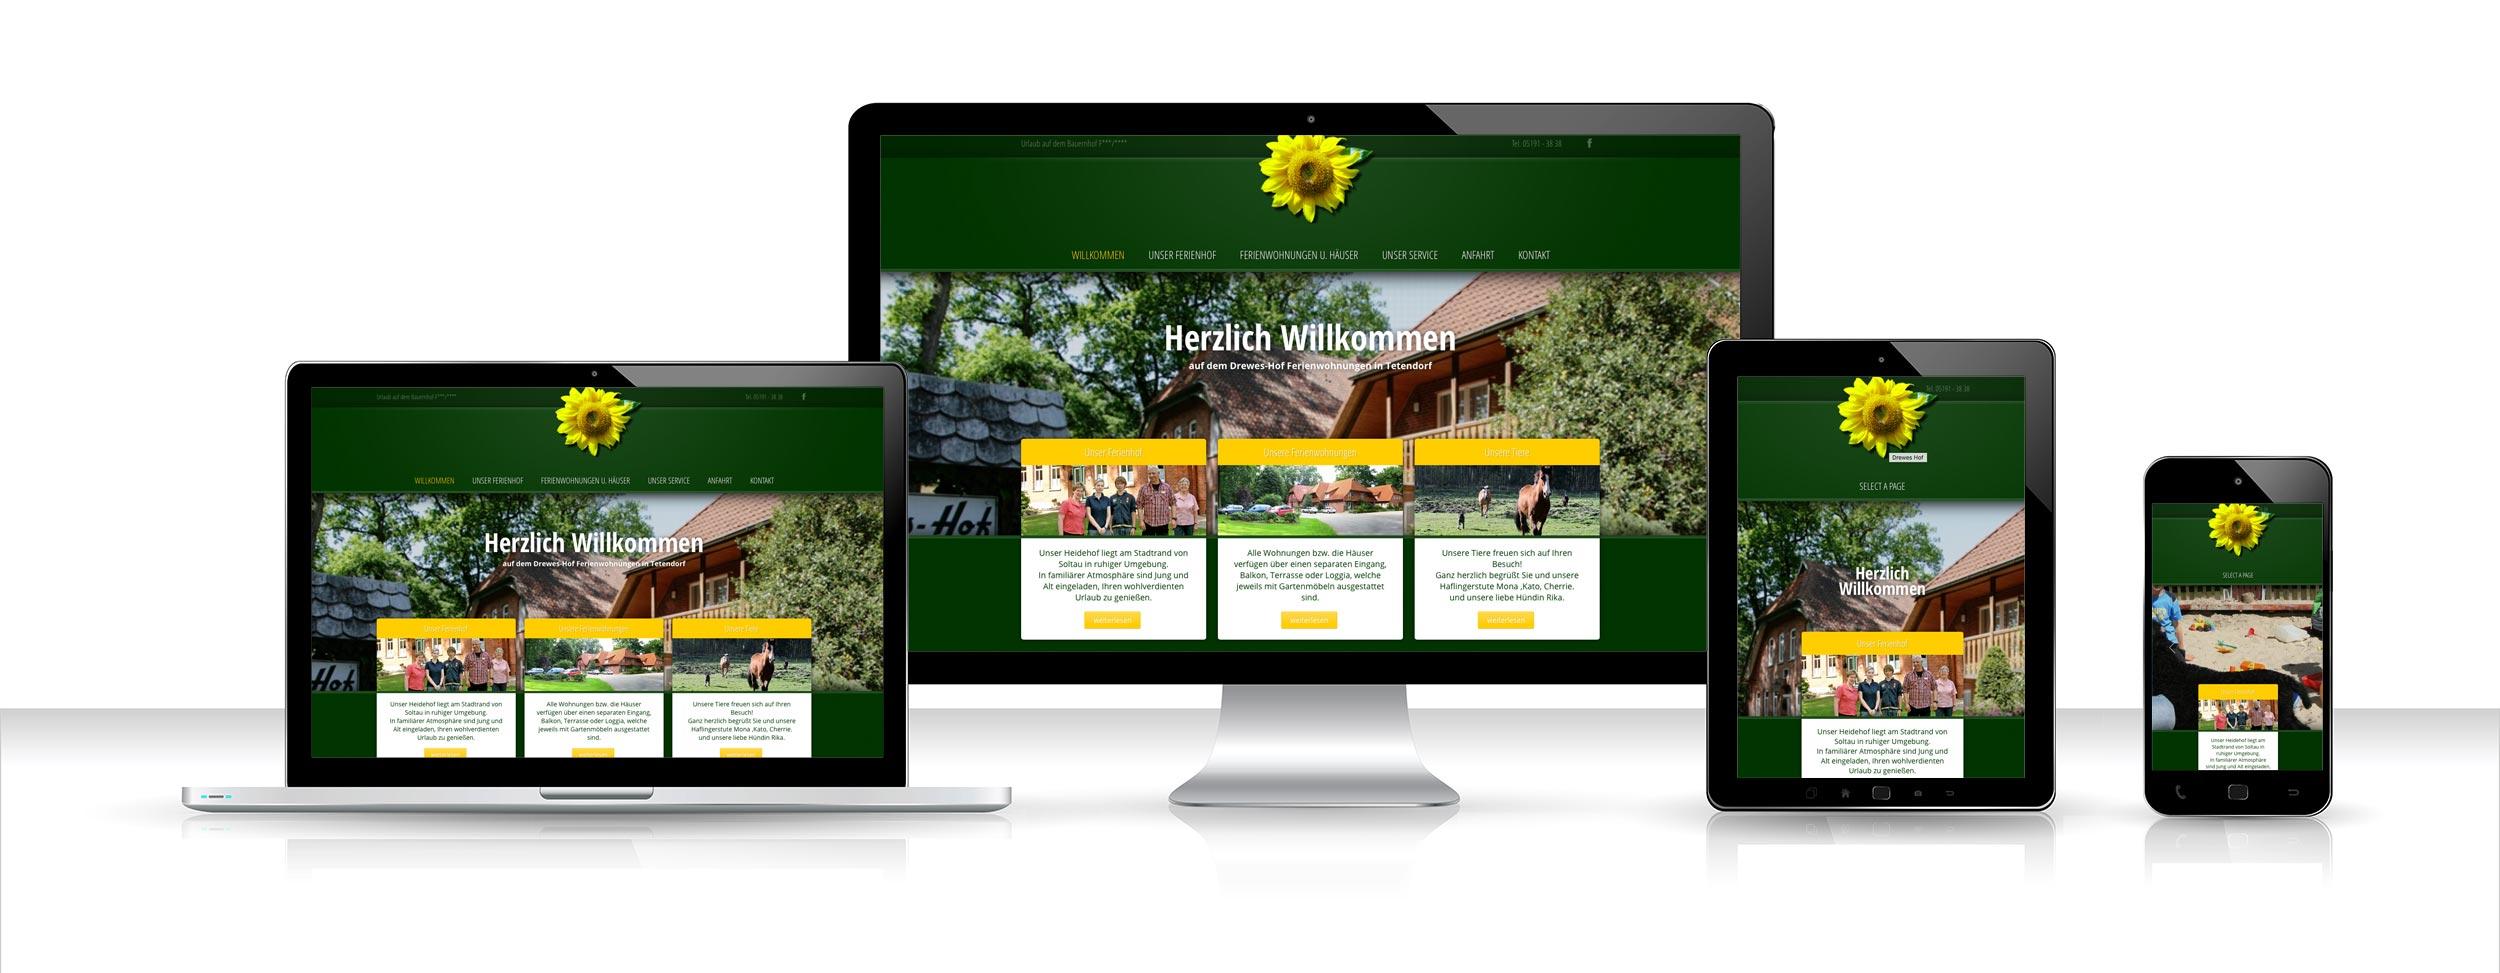 drewes hof webdesign